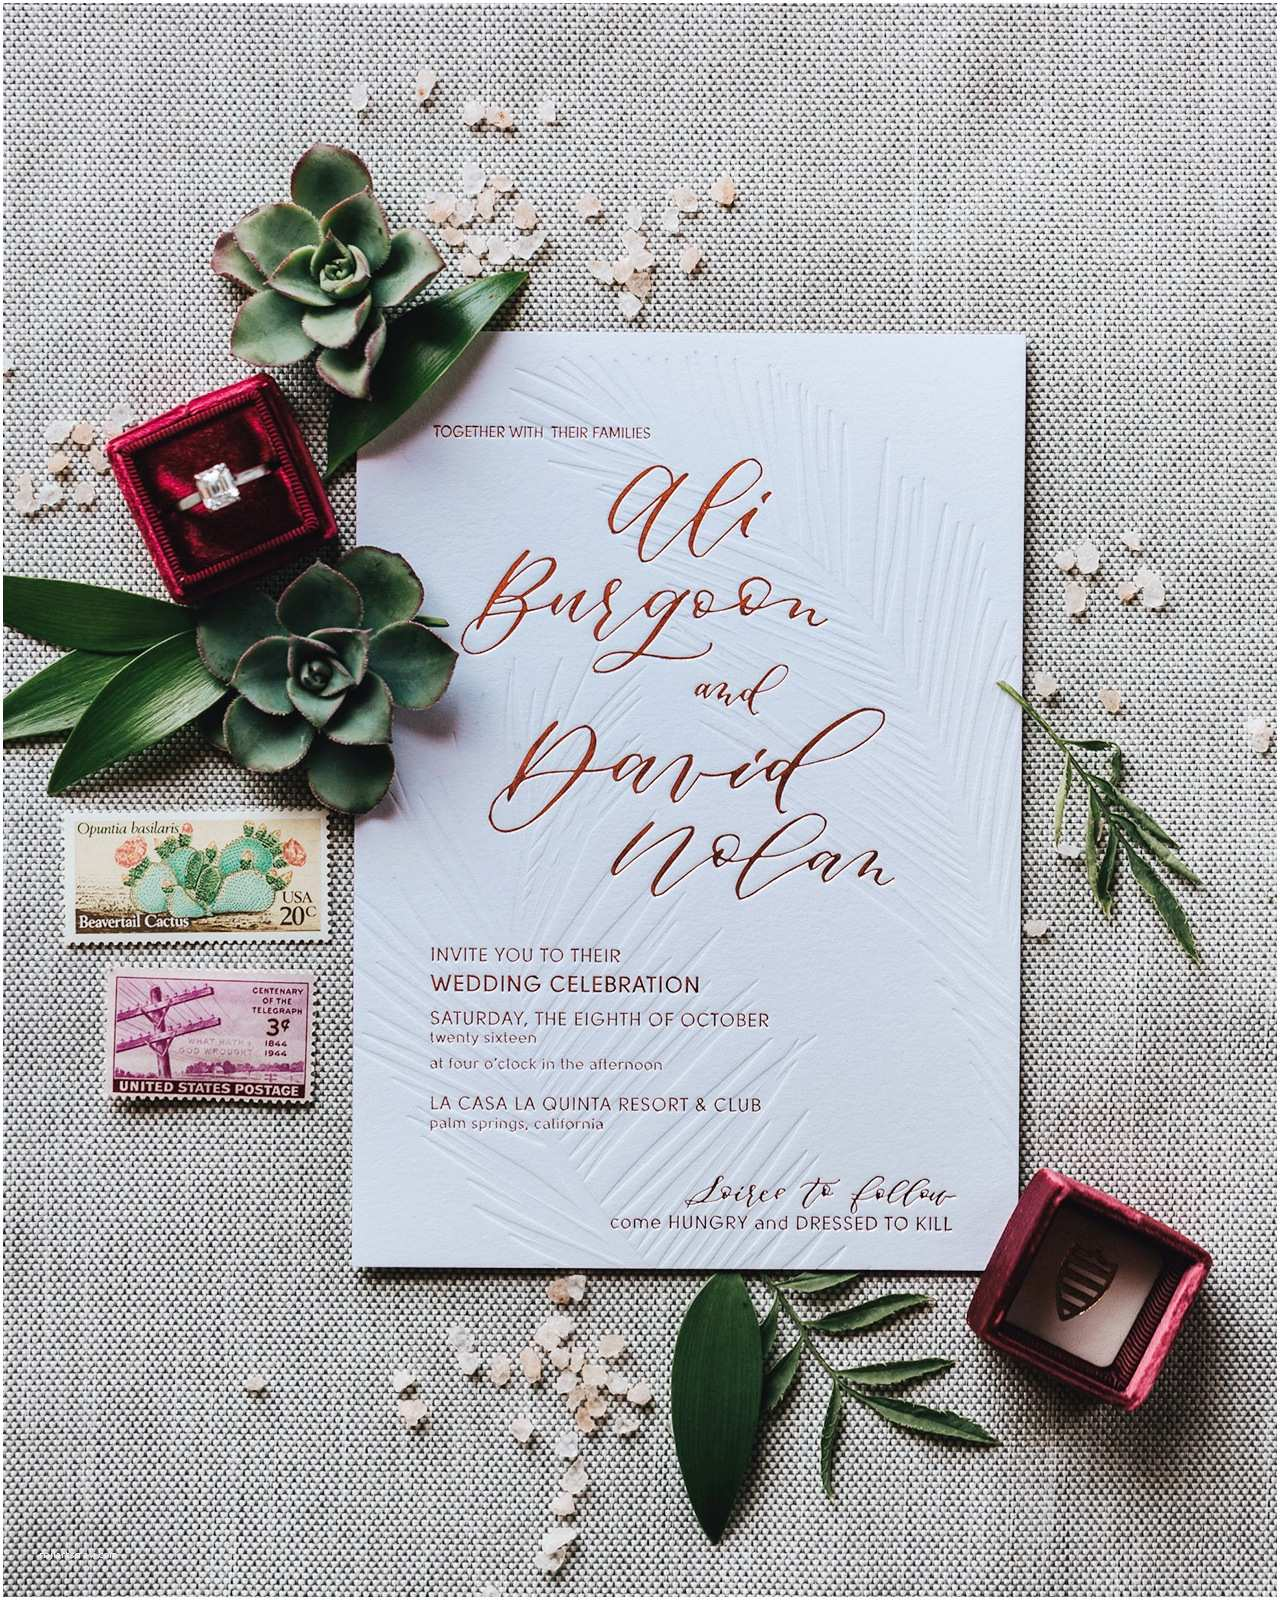 Cactus Wedding Invitations Cactus and Calligraphy Wedding Invitations